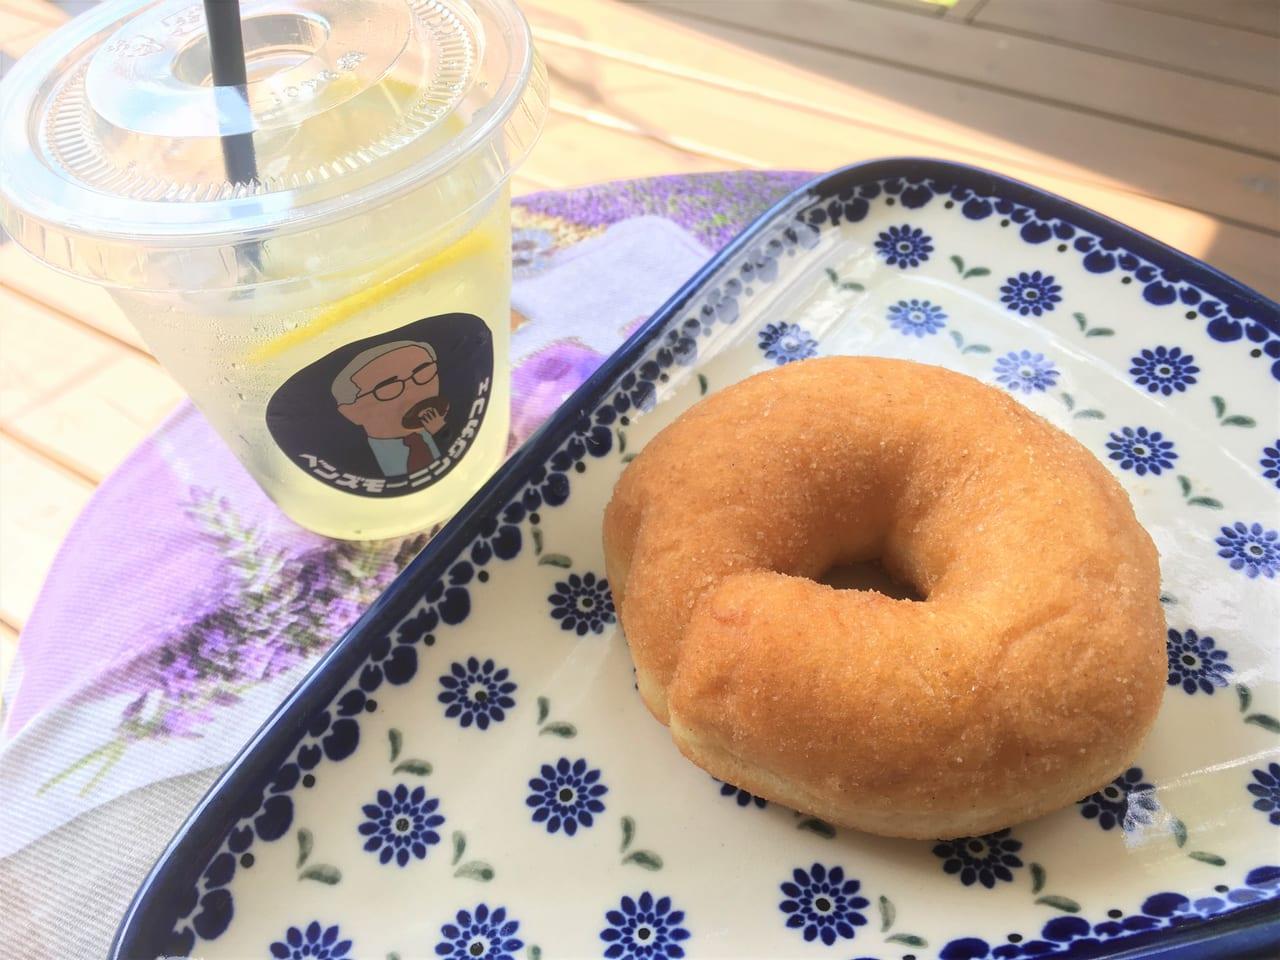 BEN'S MORNING CAFEでテイクアウトしたモーニング